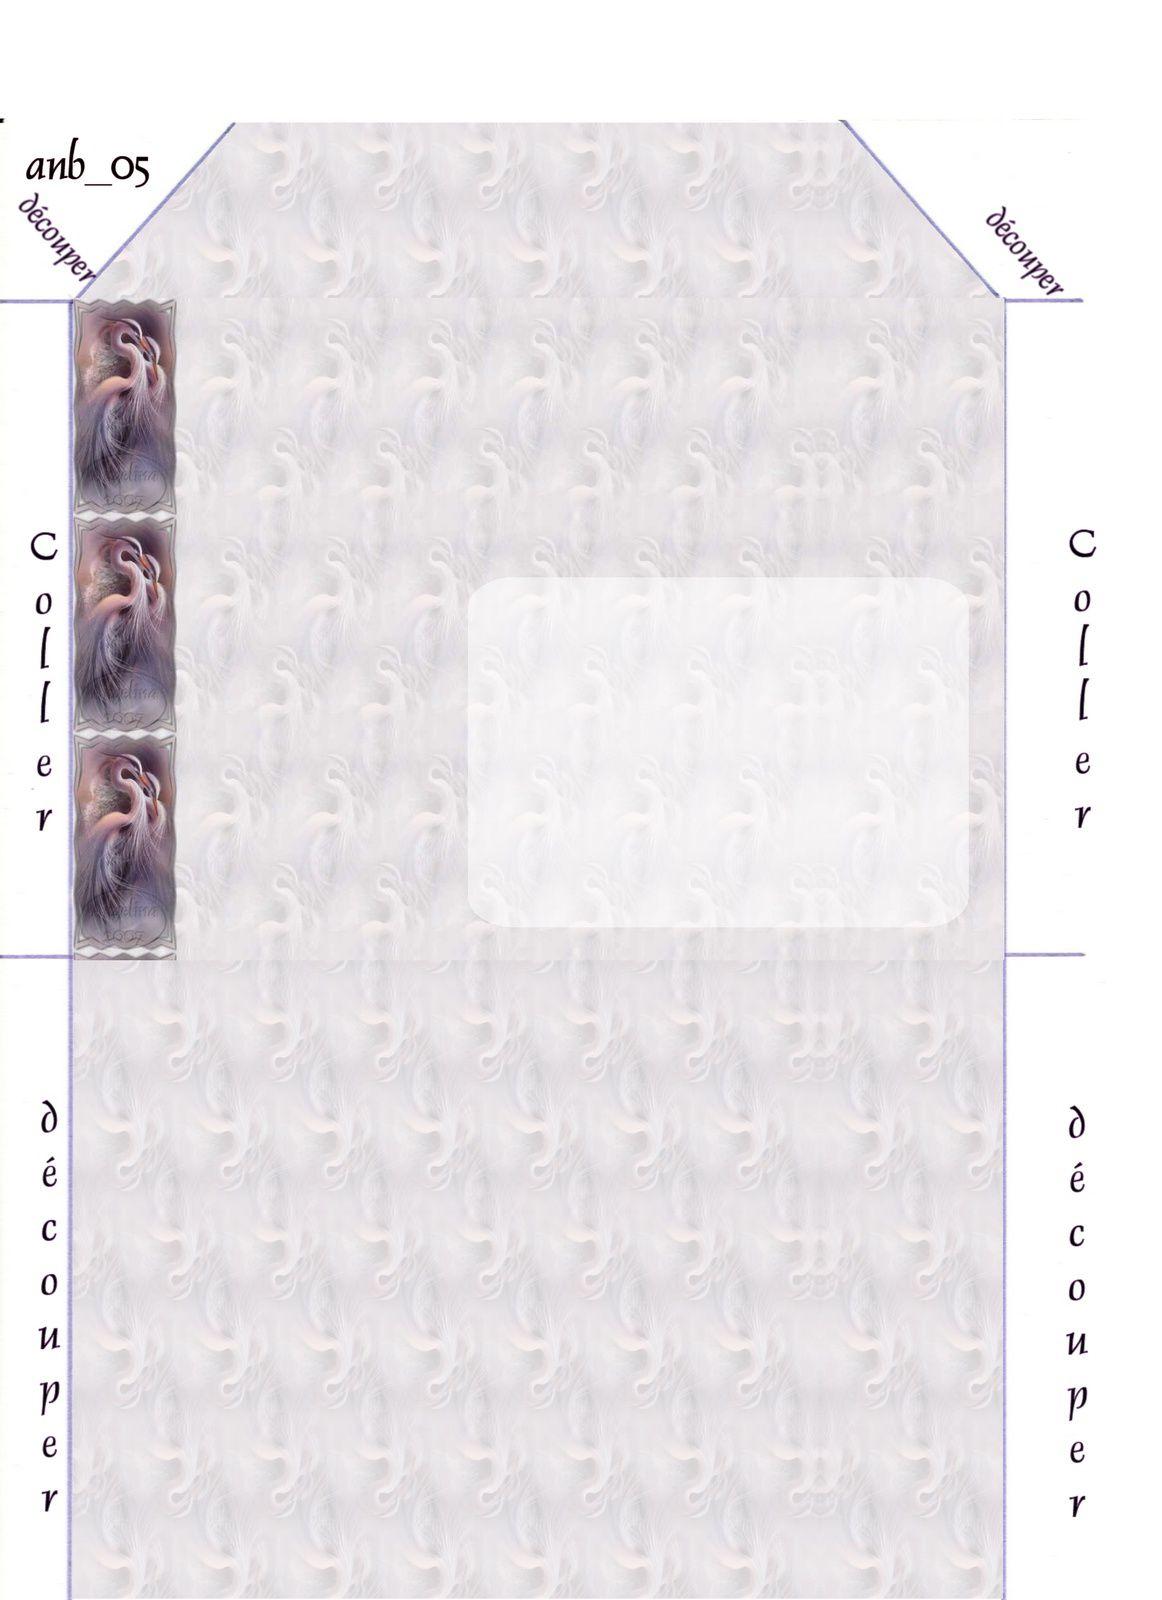 Oiseaux Incredimail &amp&#x3B; Papier A4 h l &amp&#x3B; outlook &amp&#x3B; enveloppe &amp&#x3B; 2 cartes A5 &amp&#x3B; signets 3 langues   ois_harmony